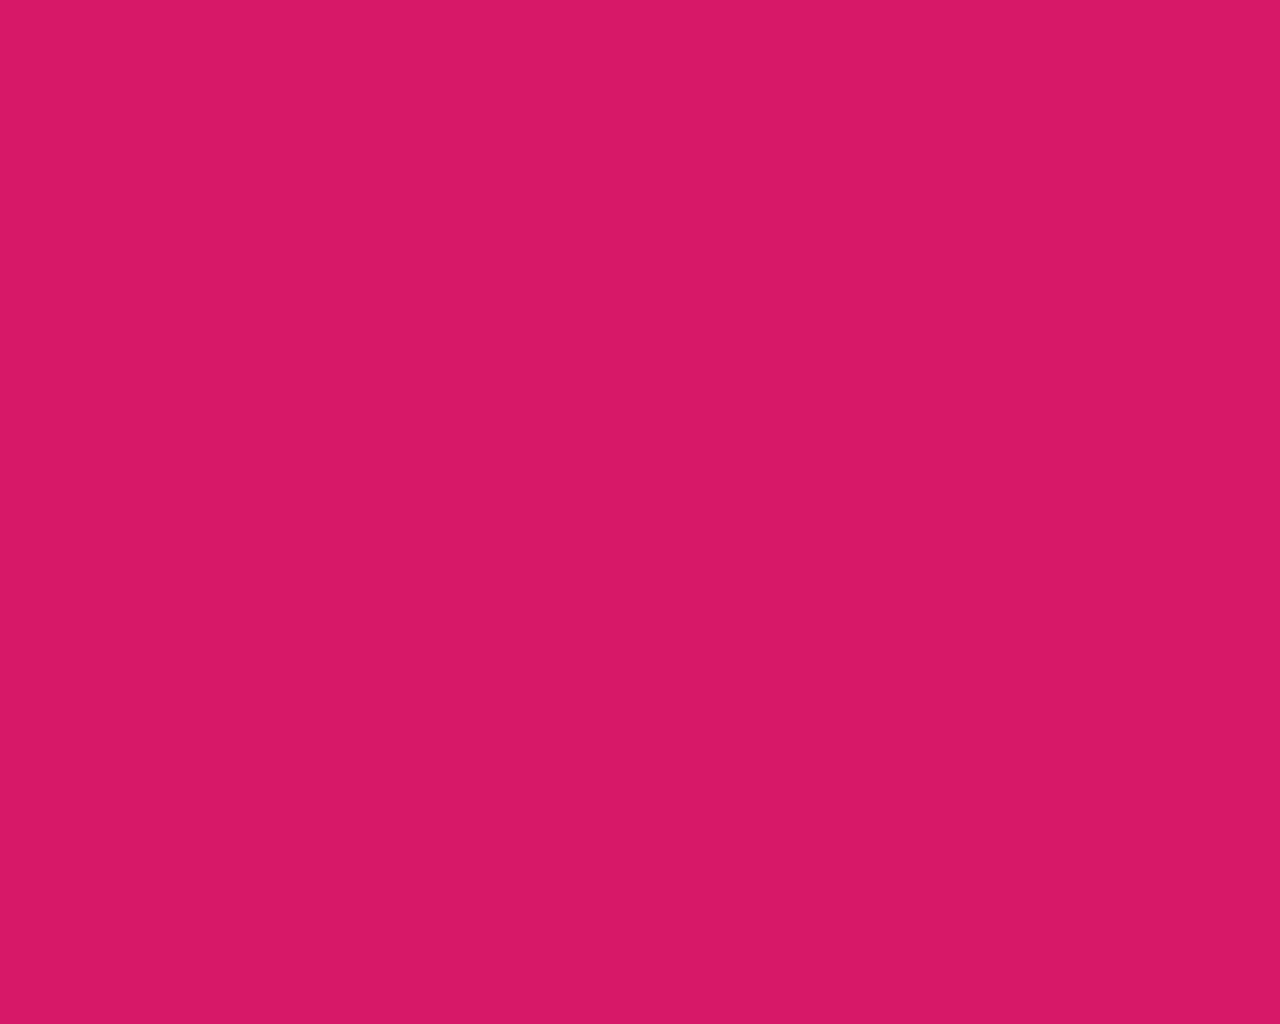 1280x1024 Dogwood Rose Solid Color Background